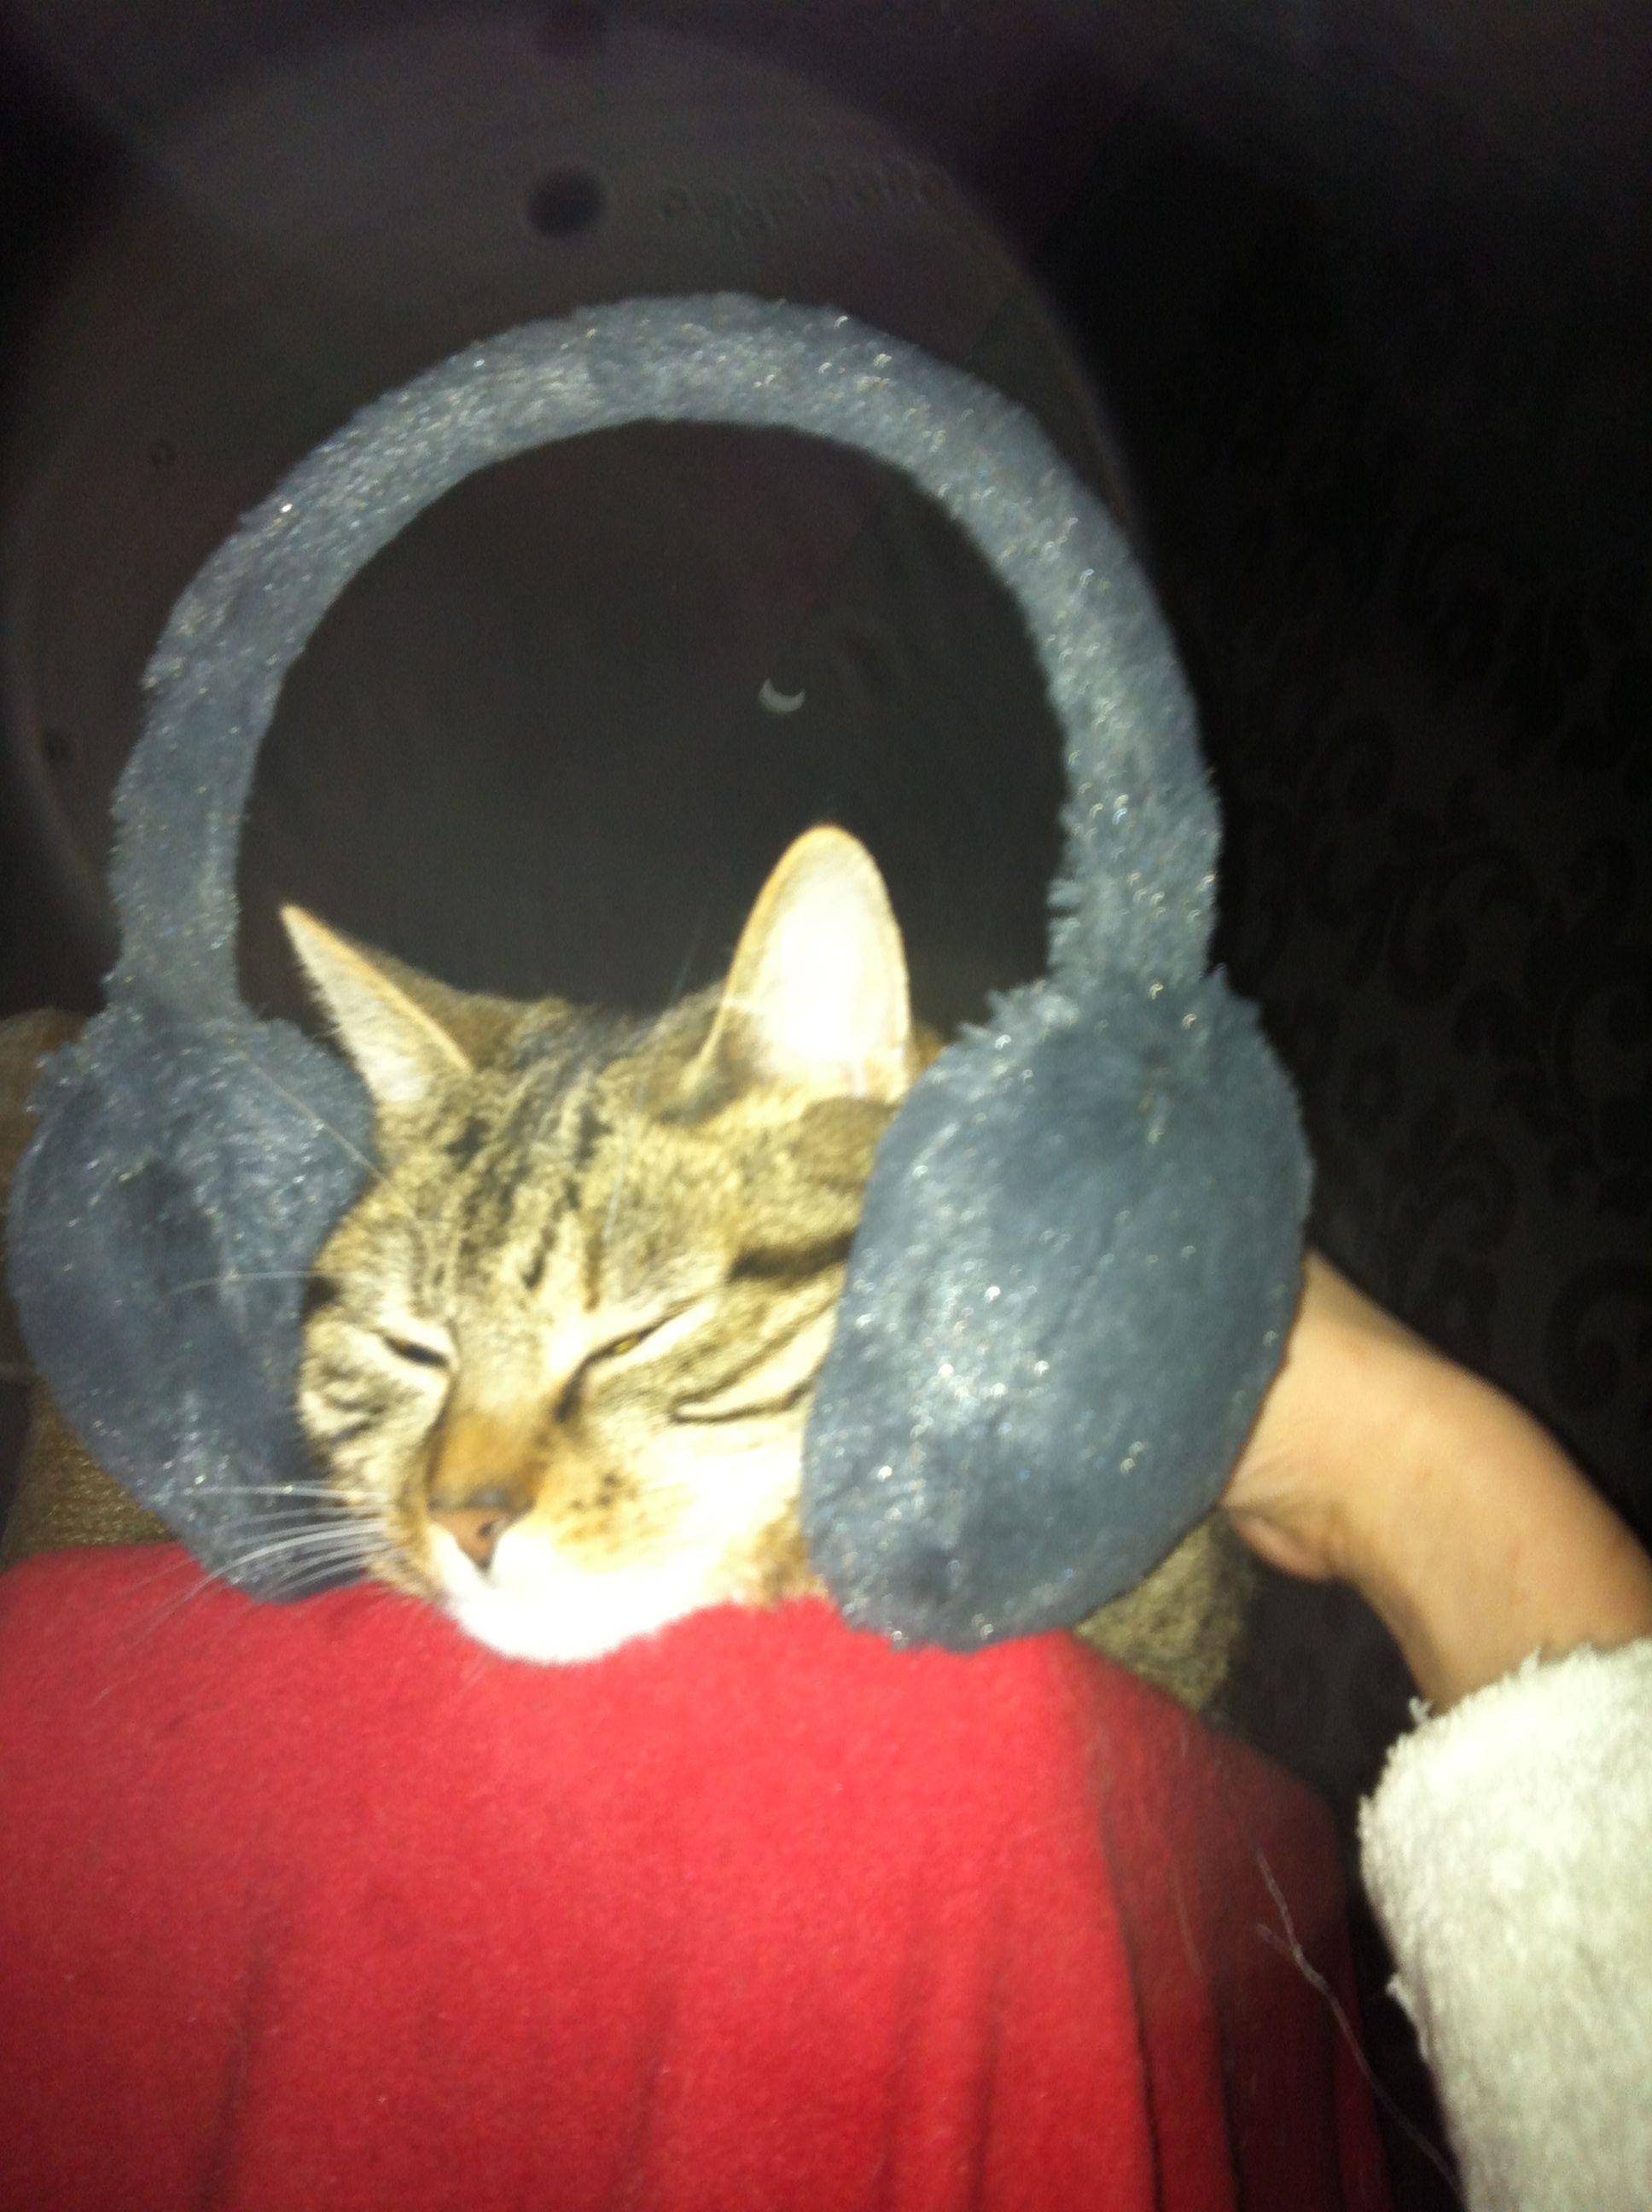 keeping her ears warm ^-^